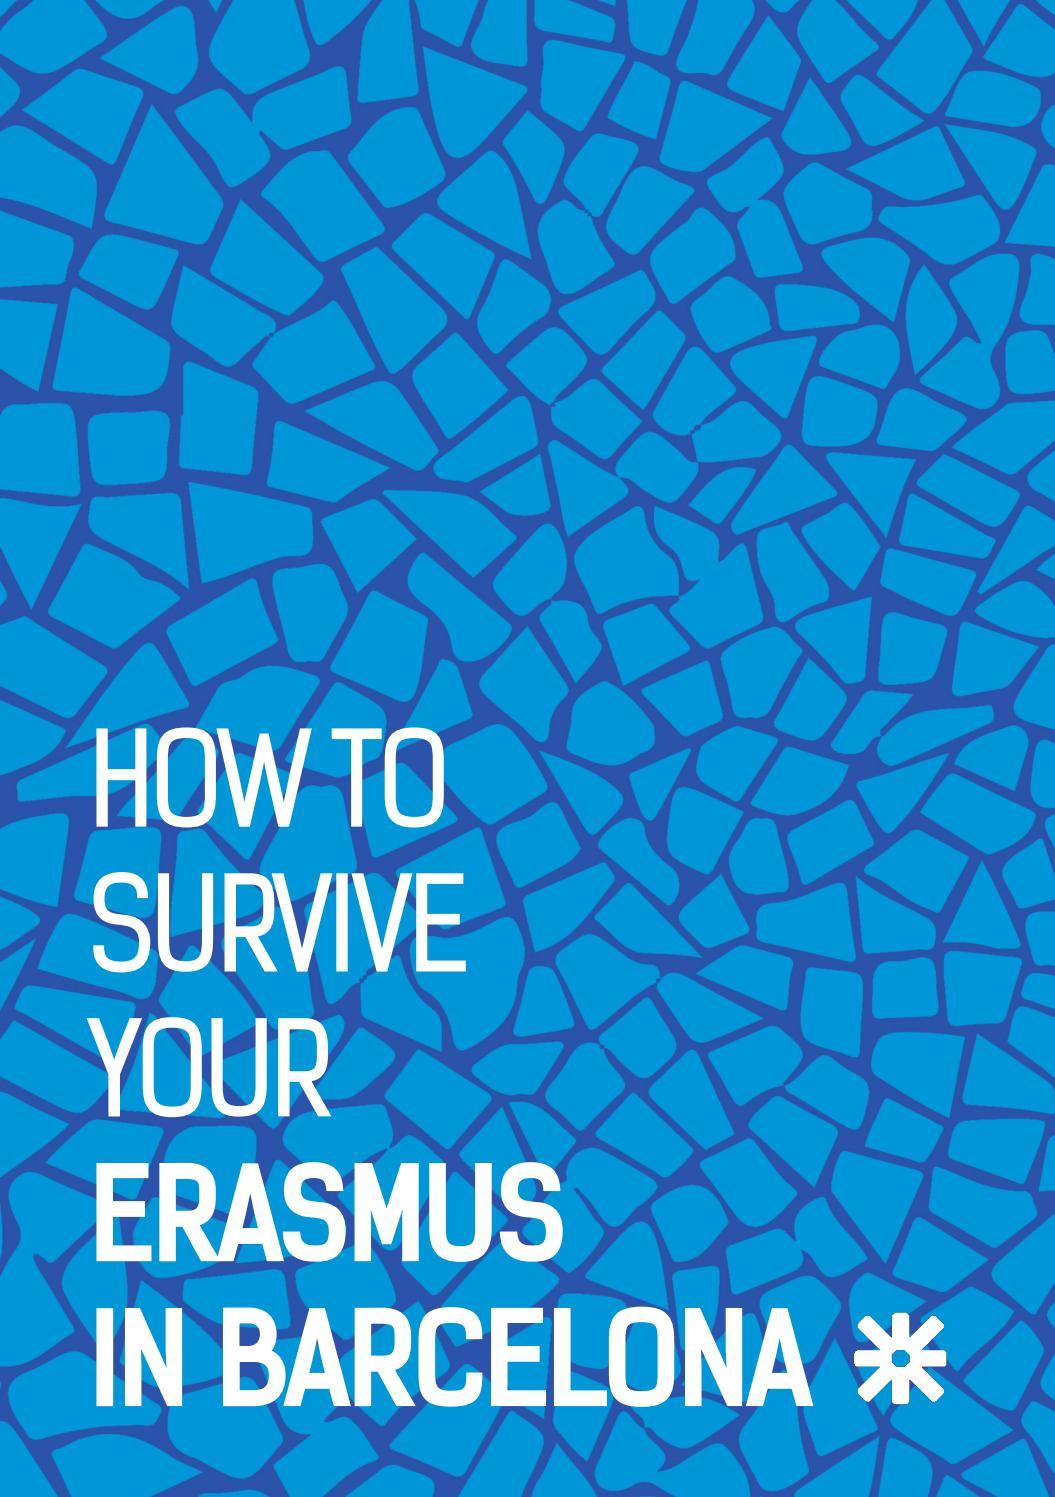 How To Survive Your Erasmus In Barcelona - ESN Barcelona UPF